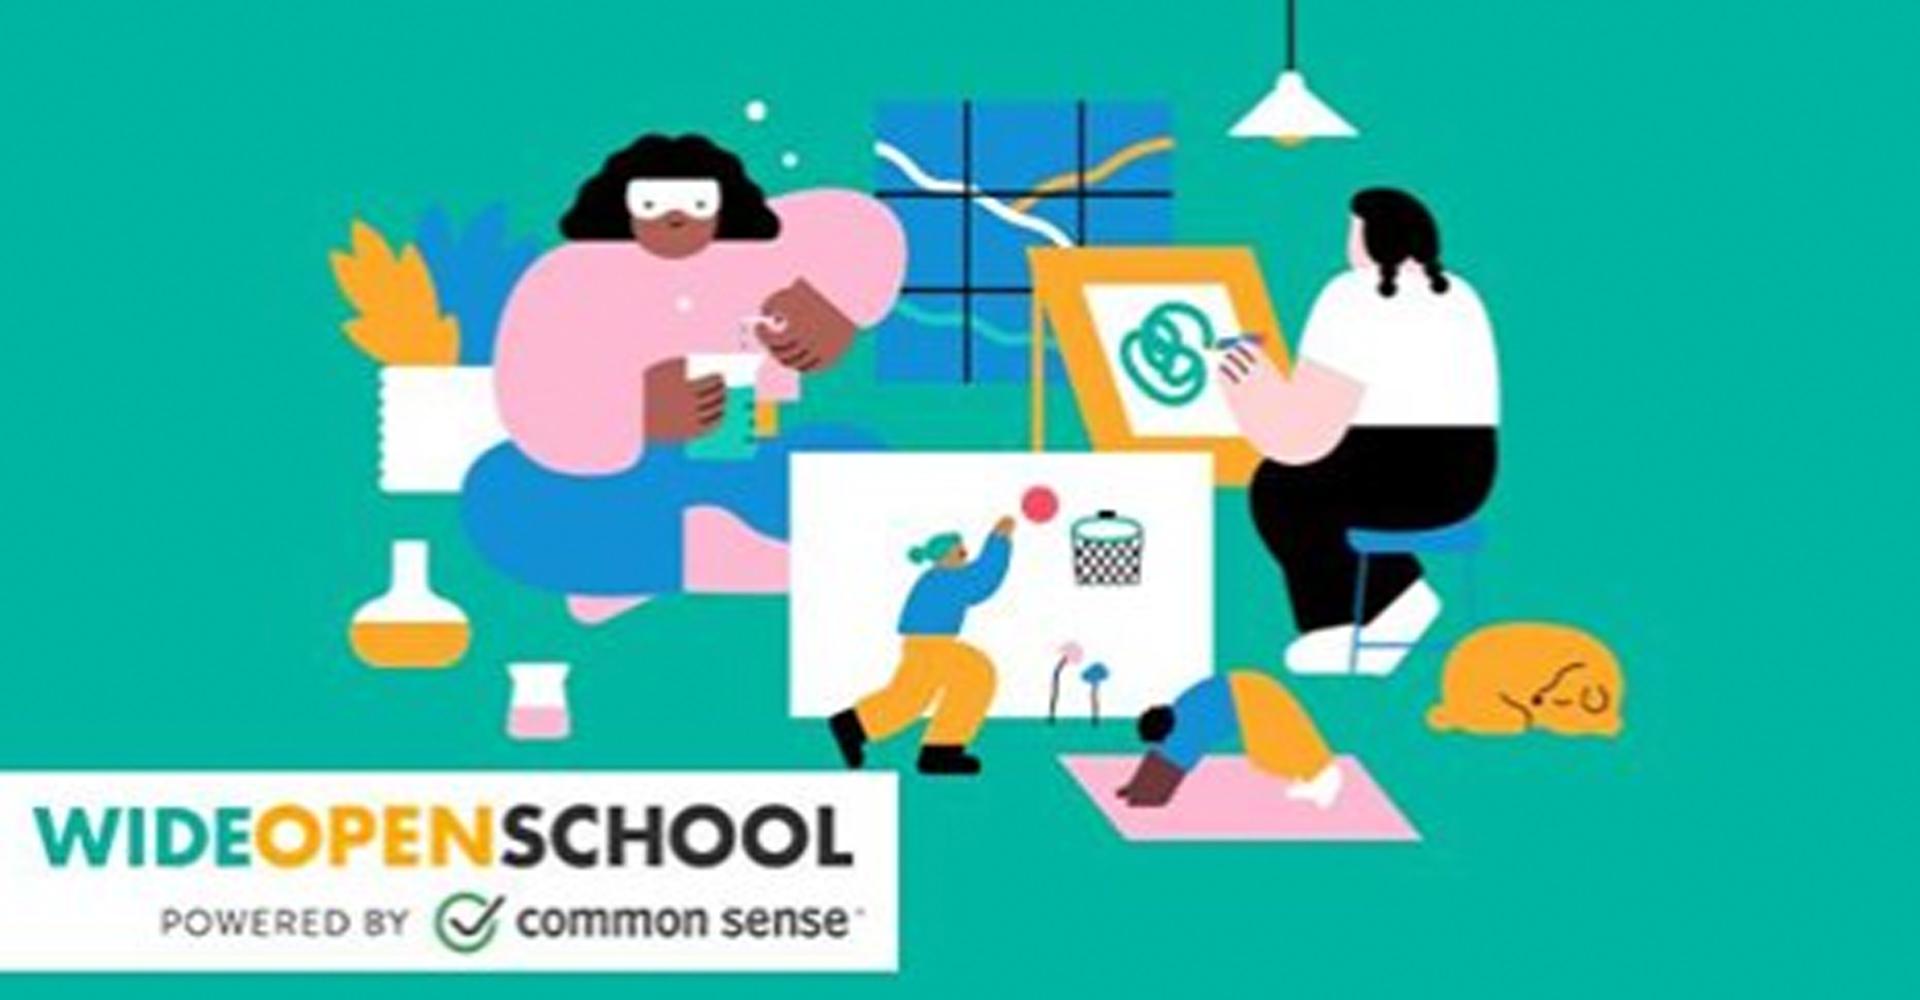 Common Sense Launches Wide Open School